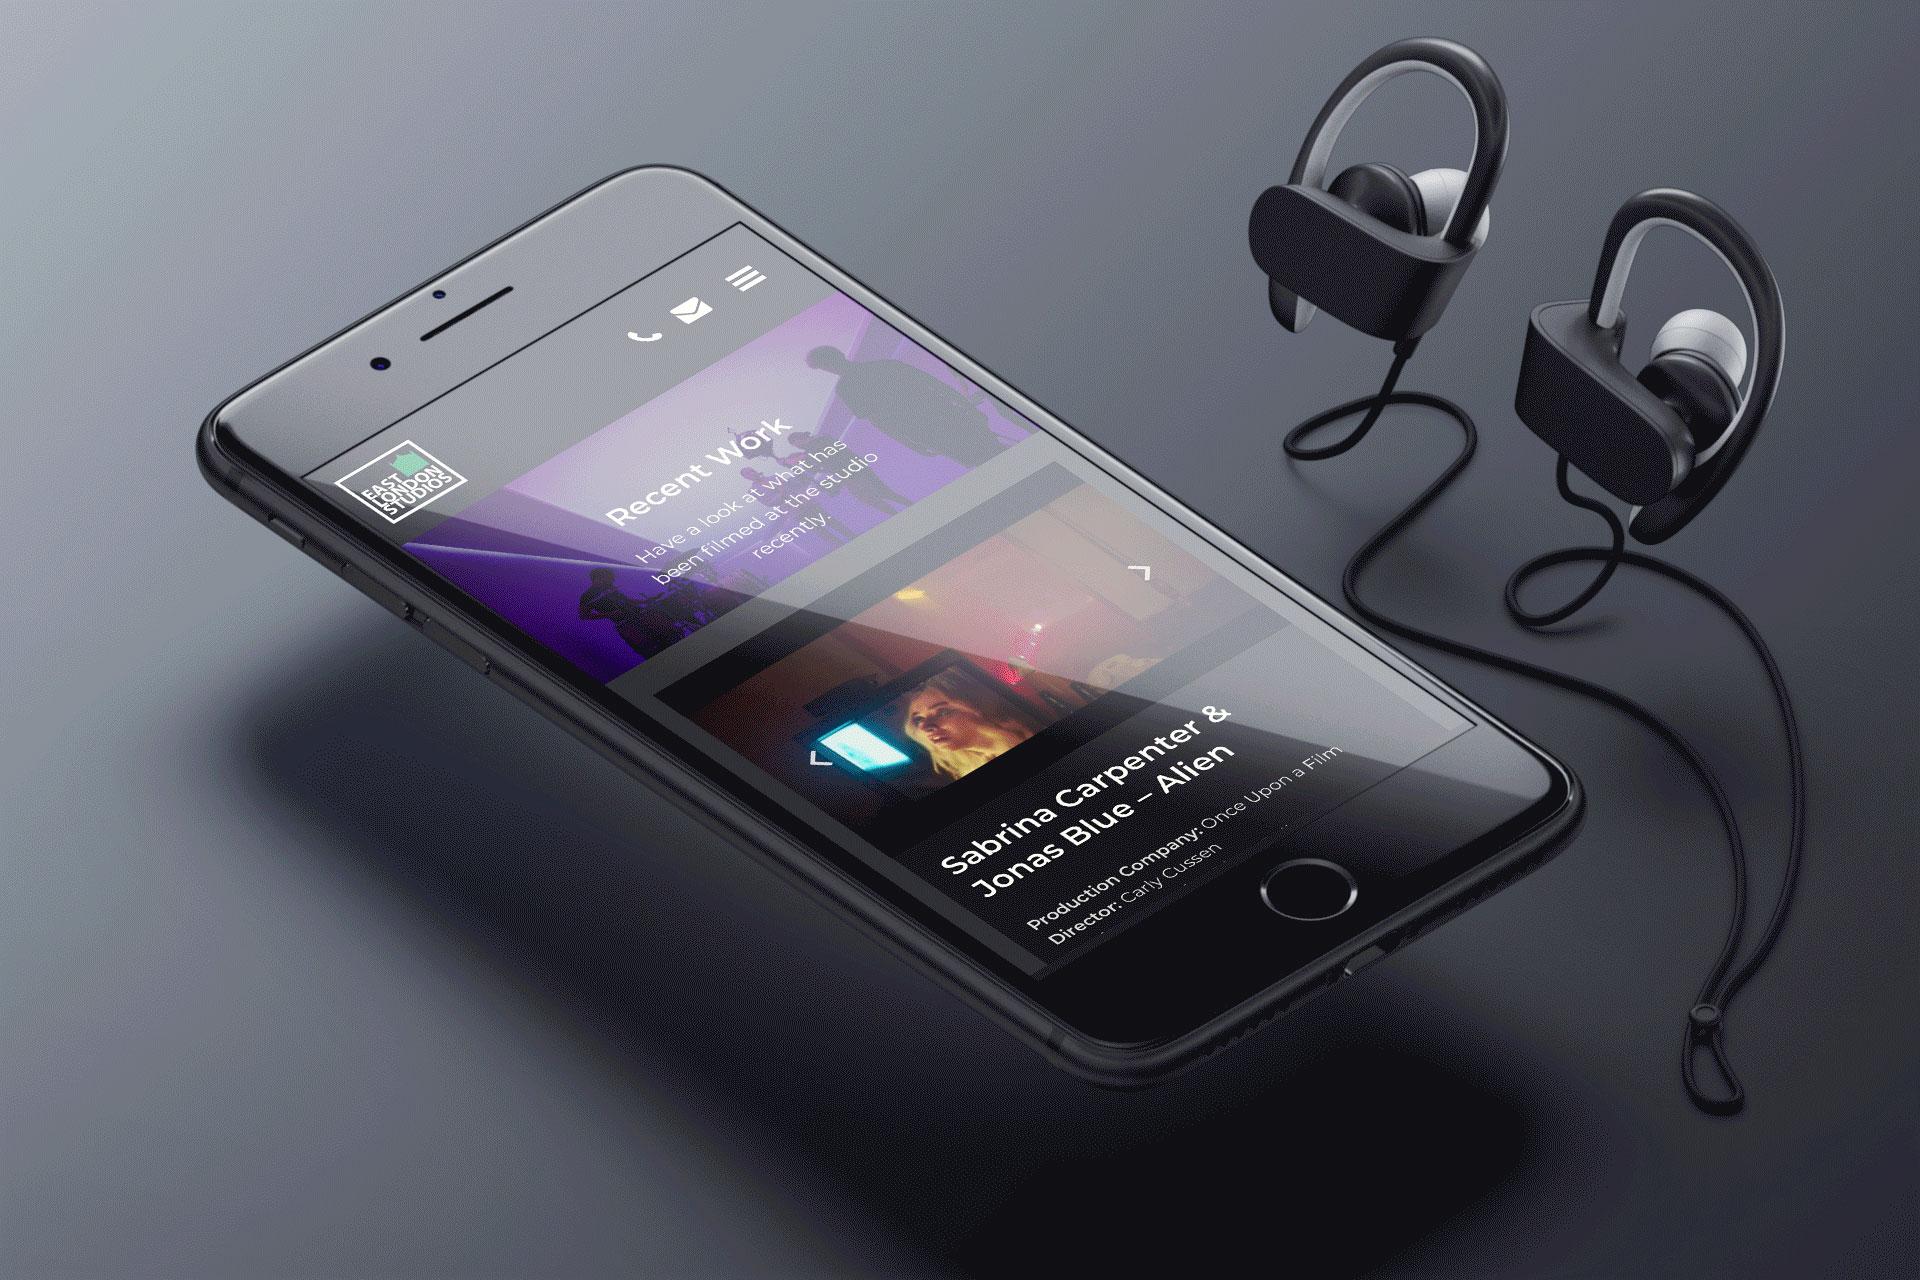 east-london-studio-iphone-1